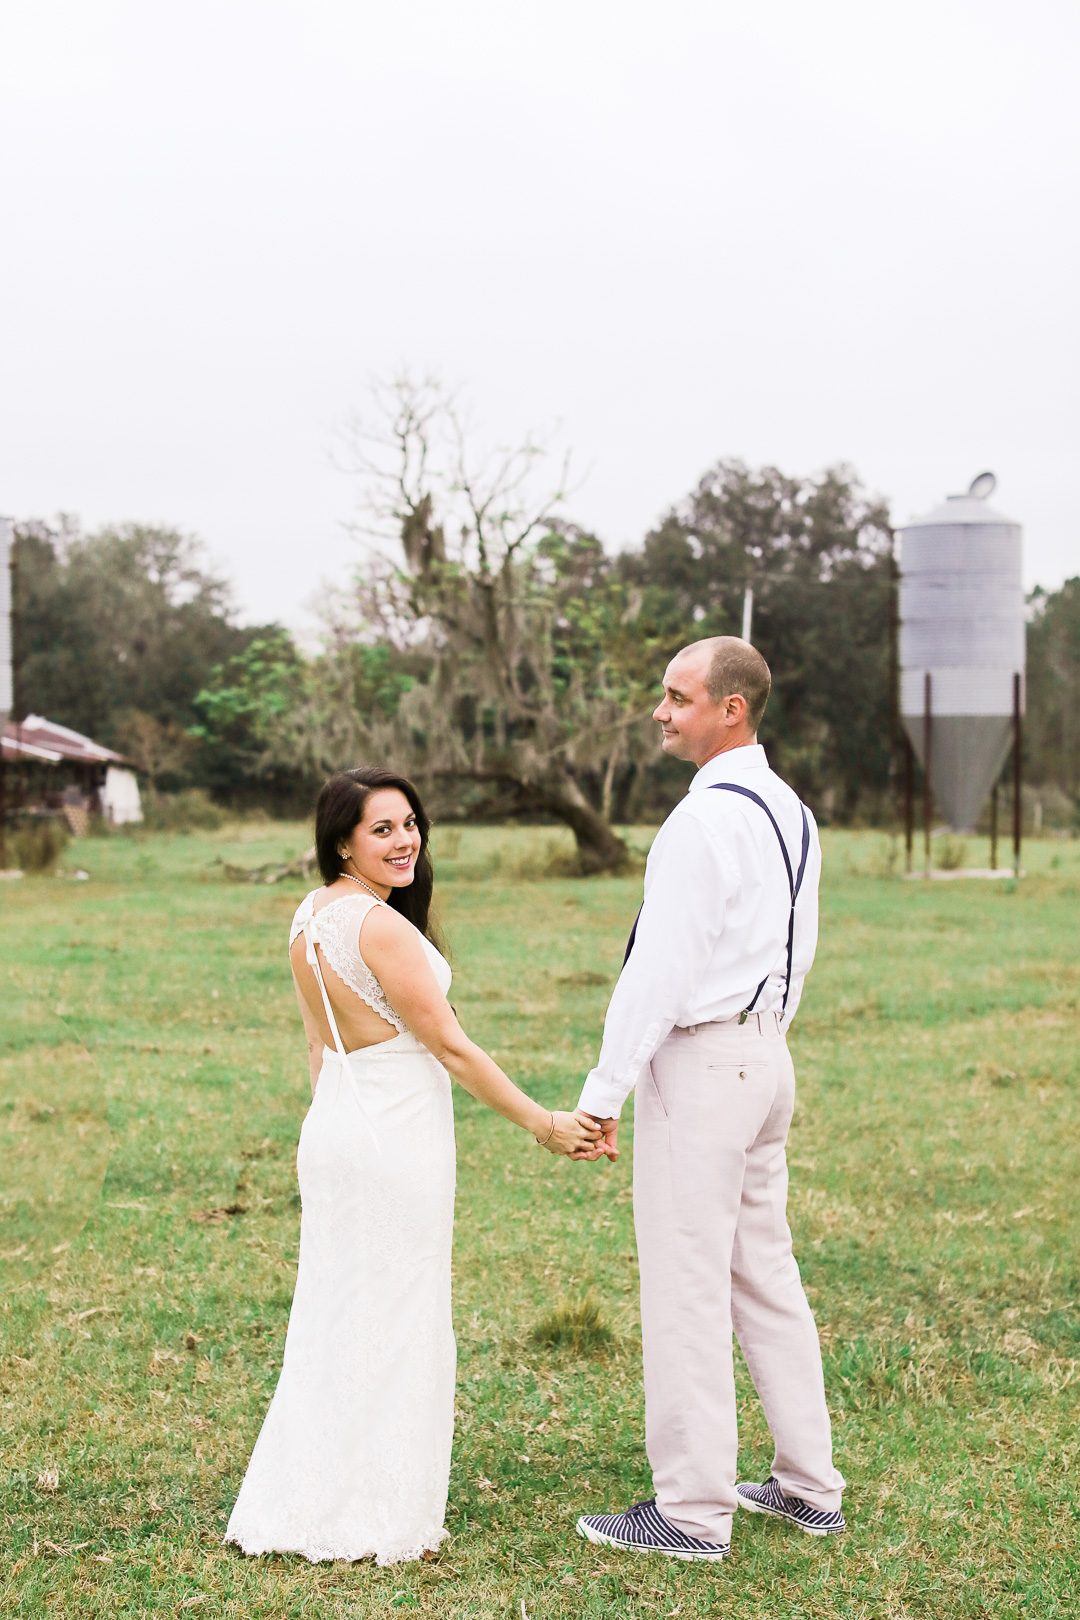 williams_family_newlywed-183.jpg